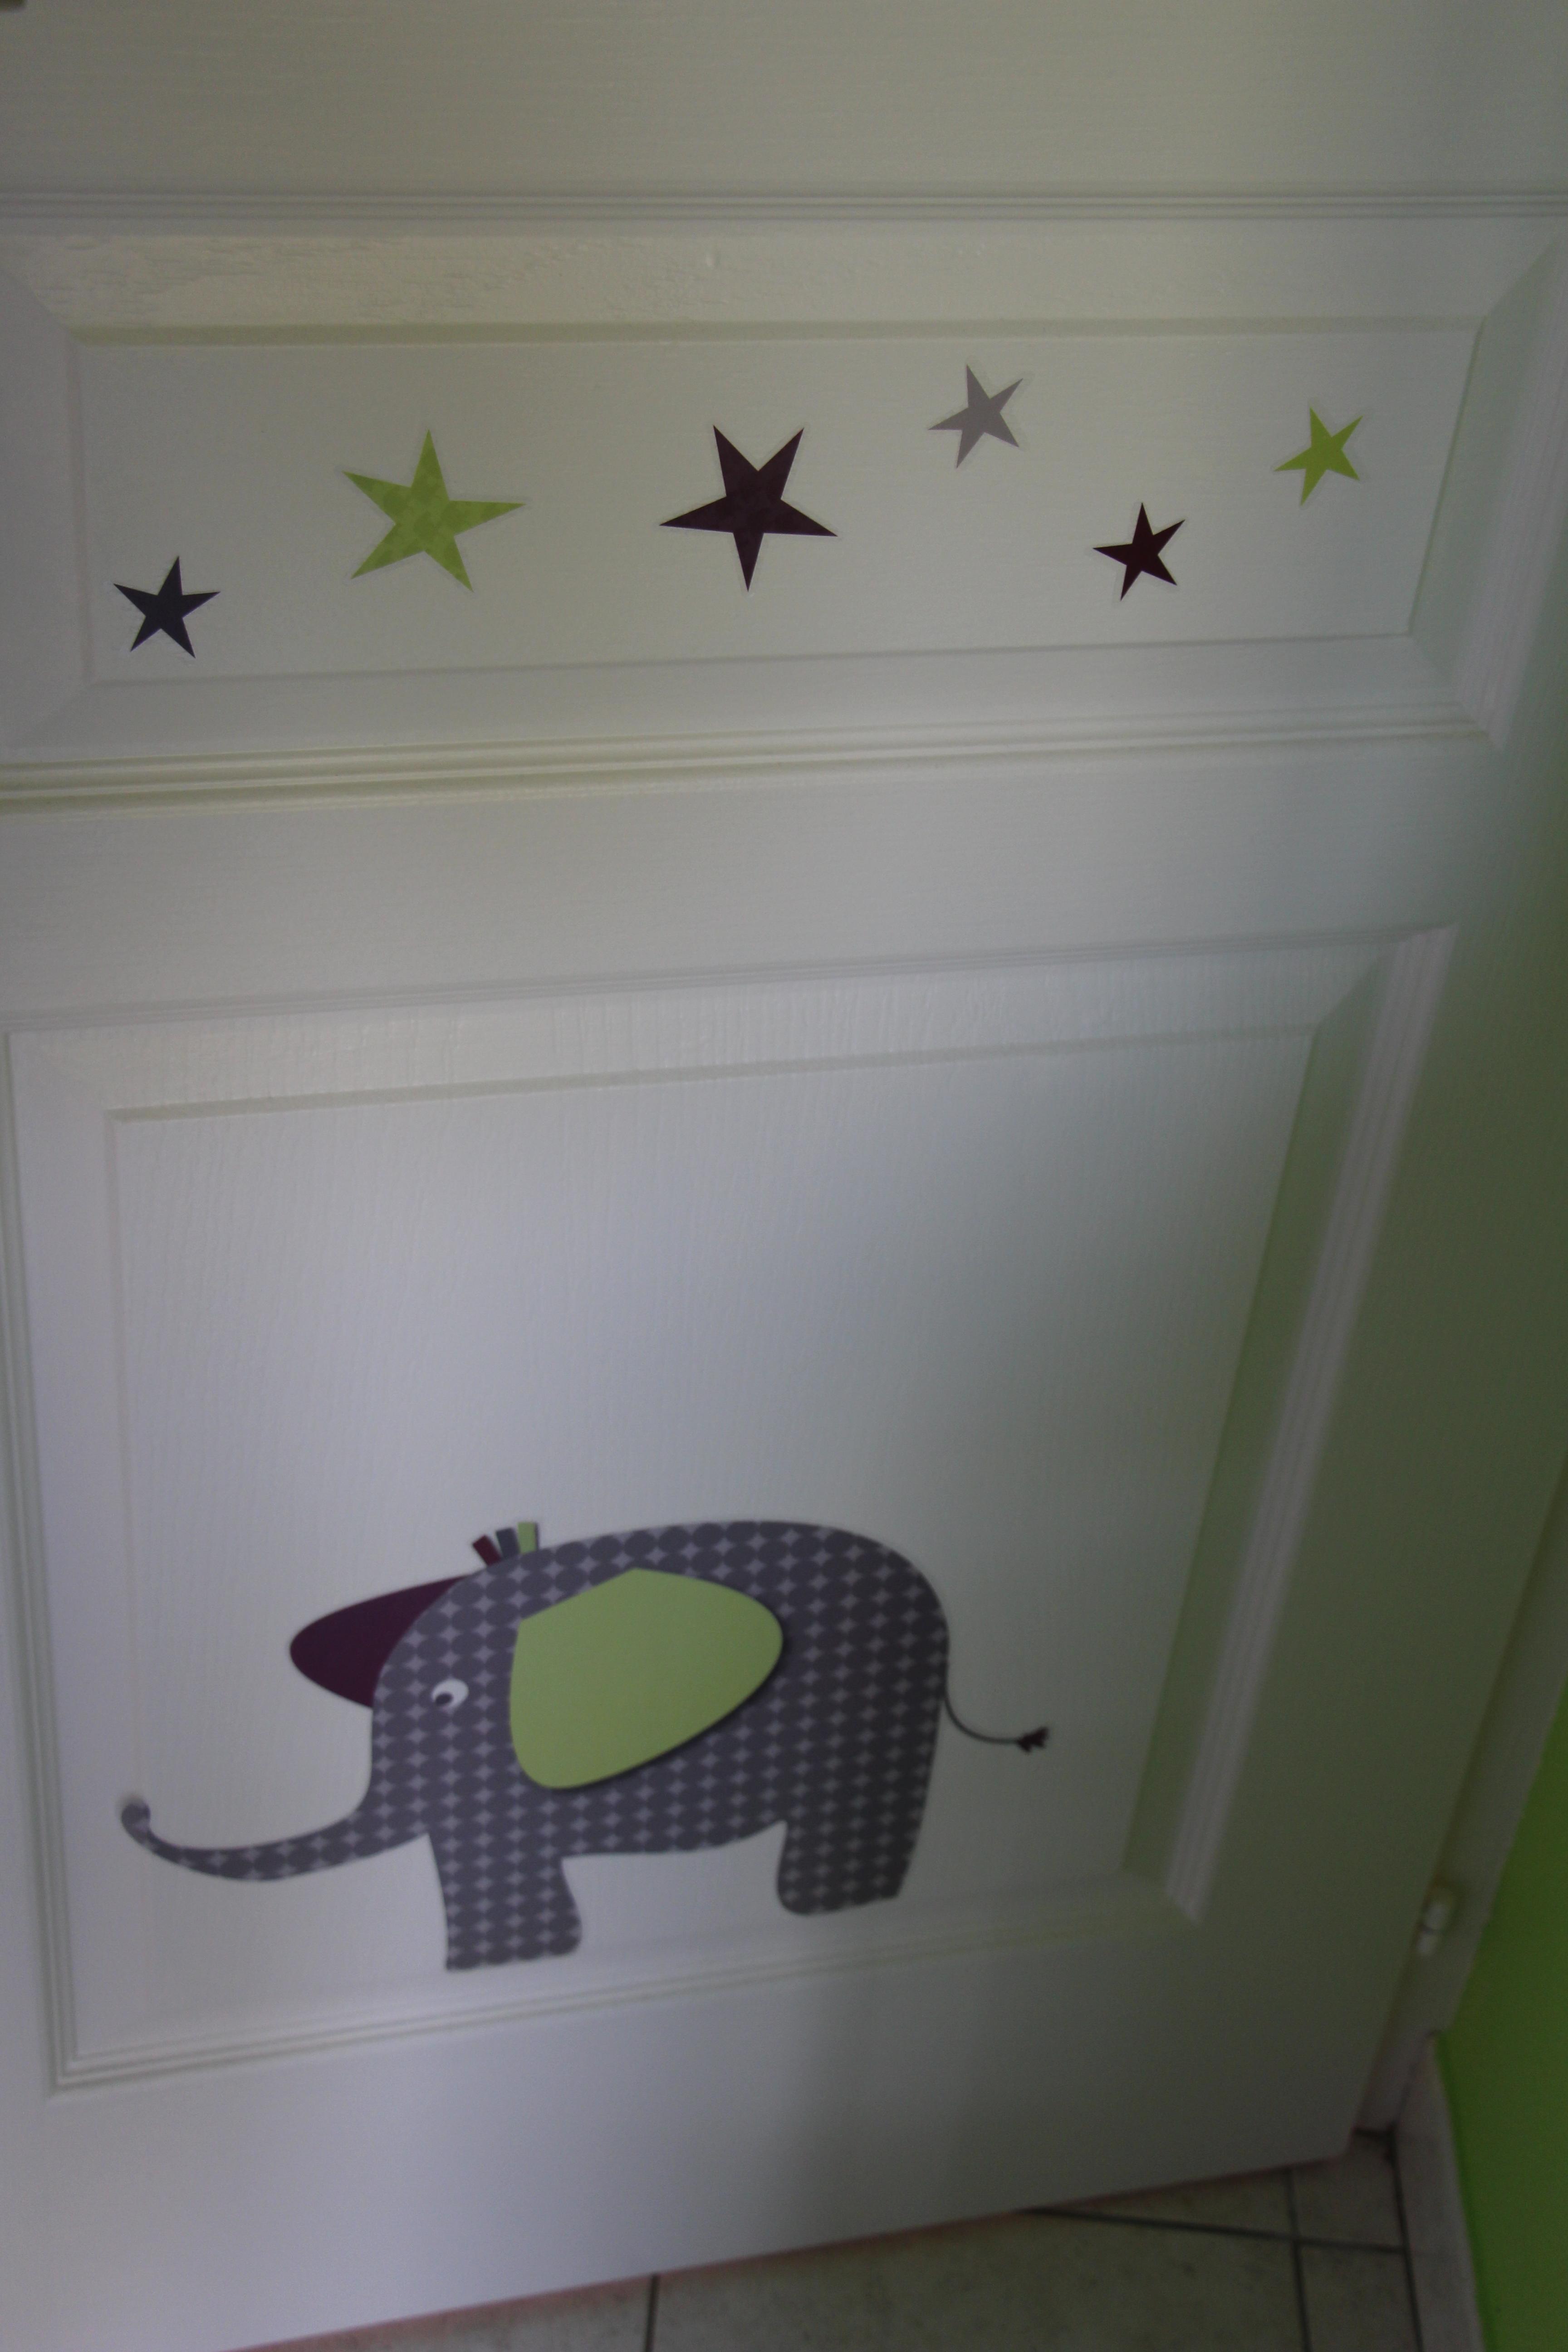 Charmant stickers deco chambre bebe for Stickers deco chambre enfant